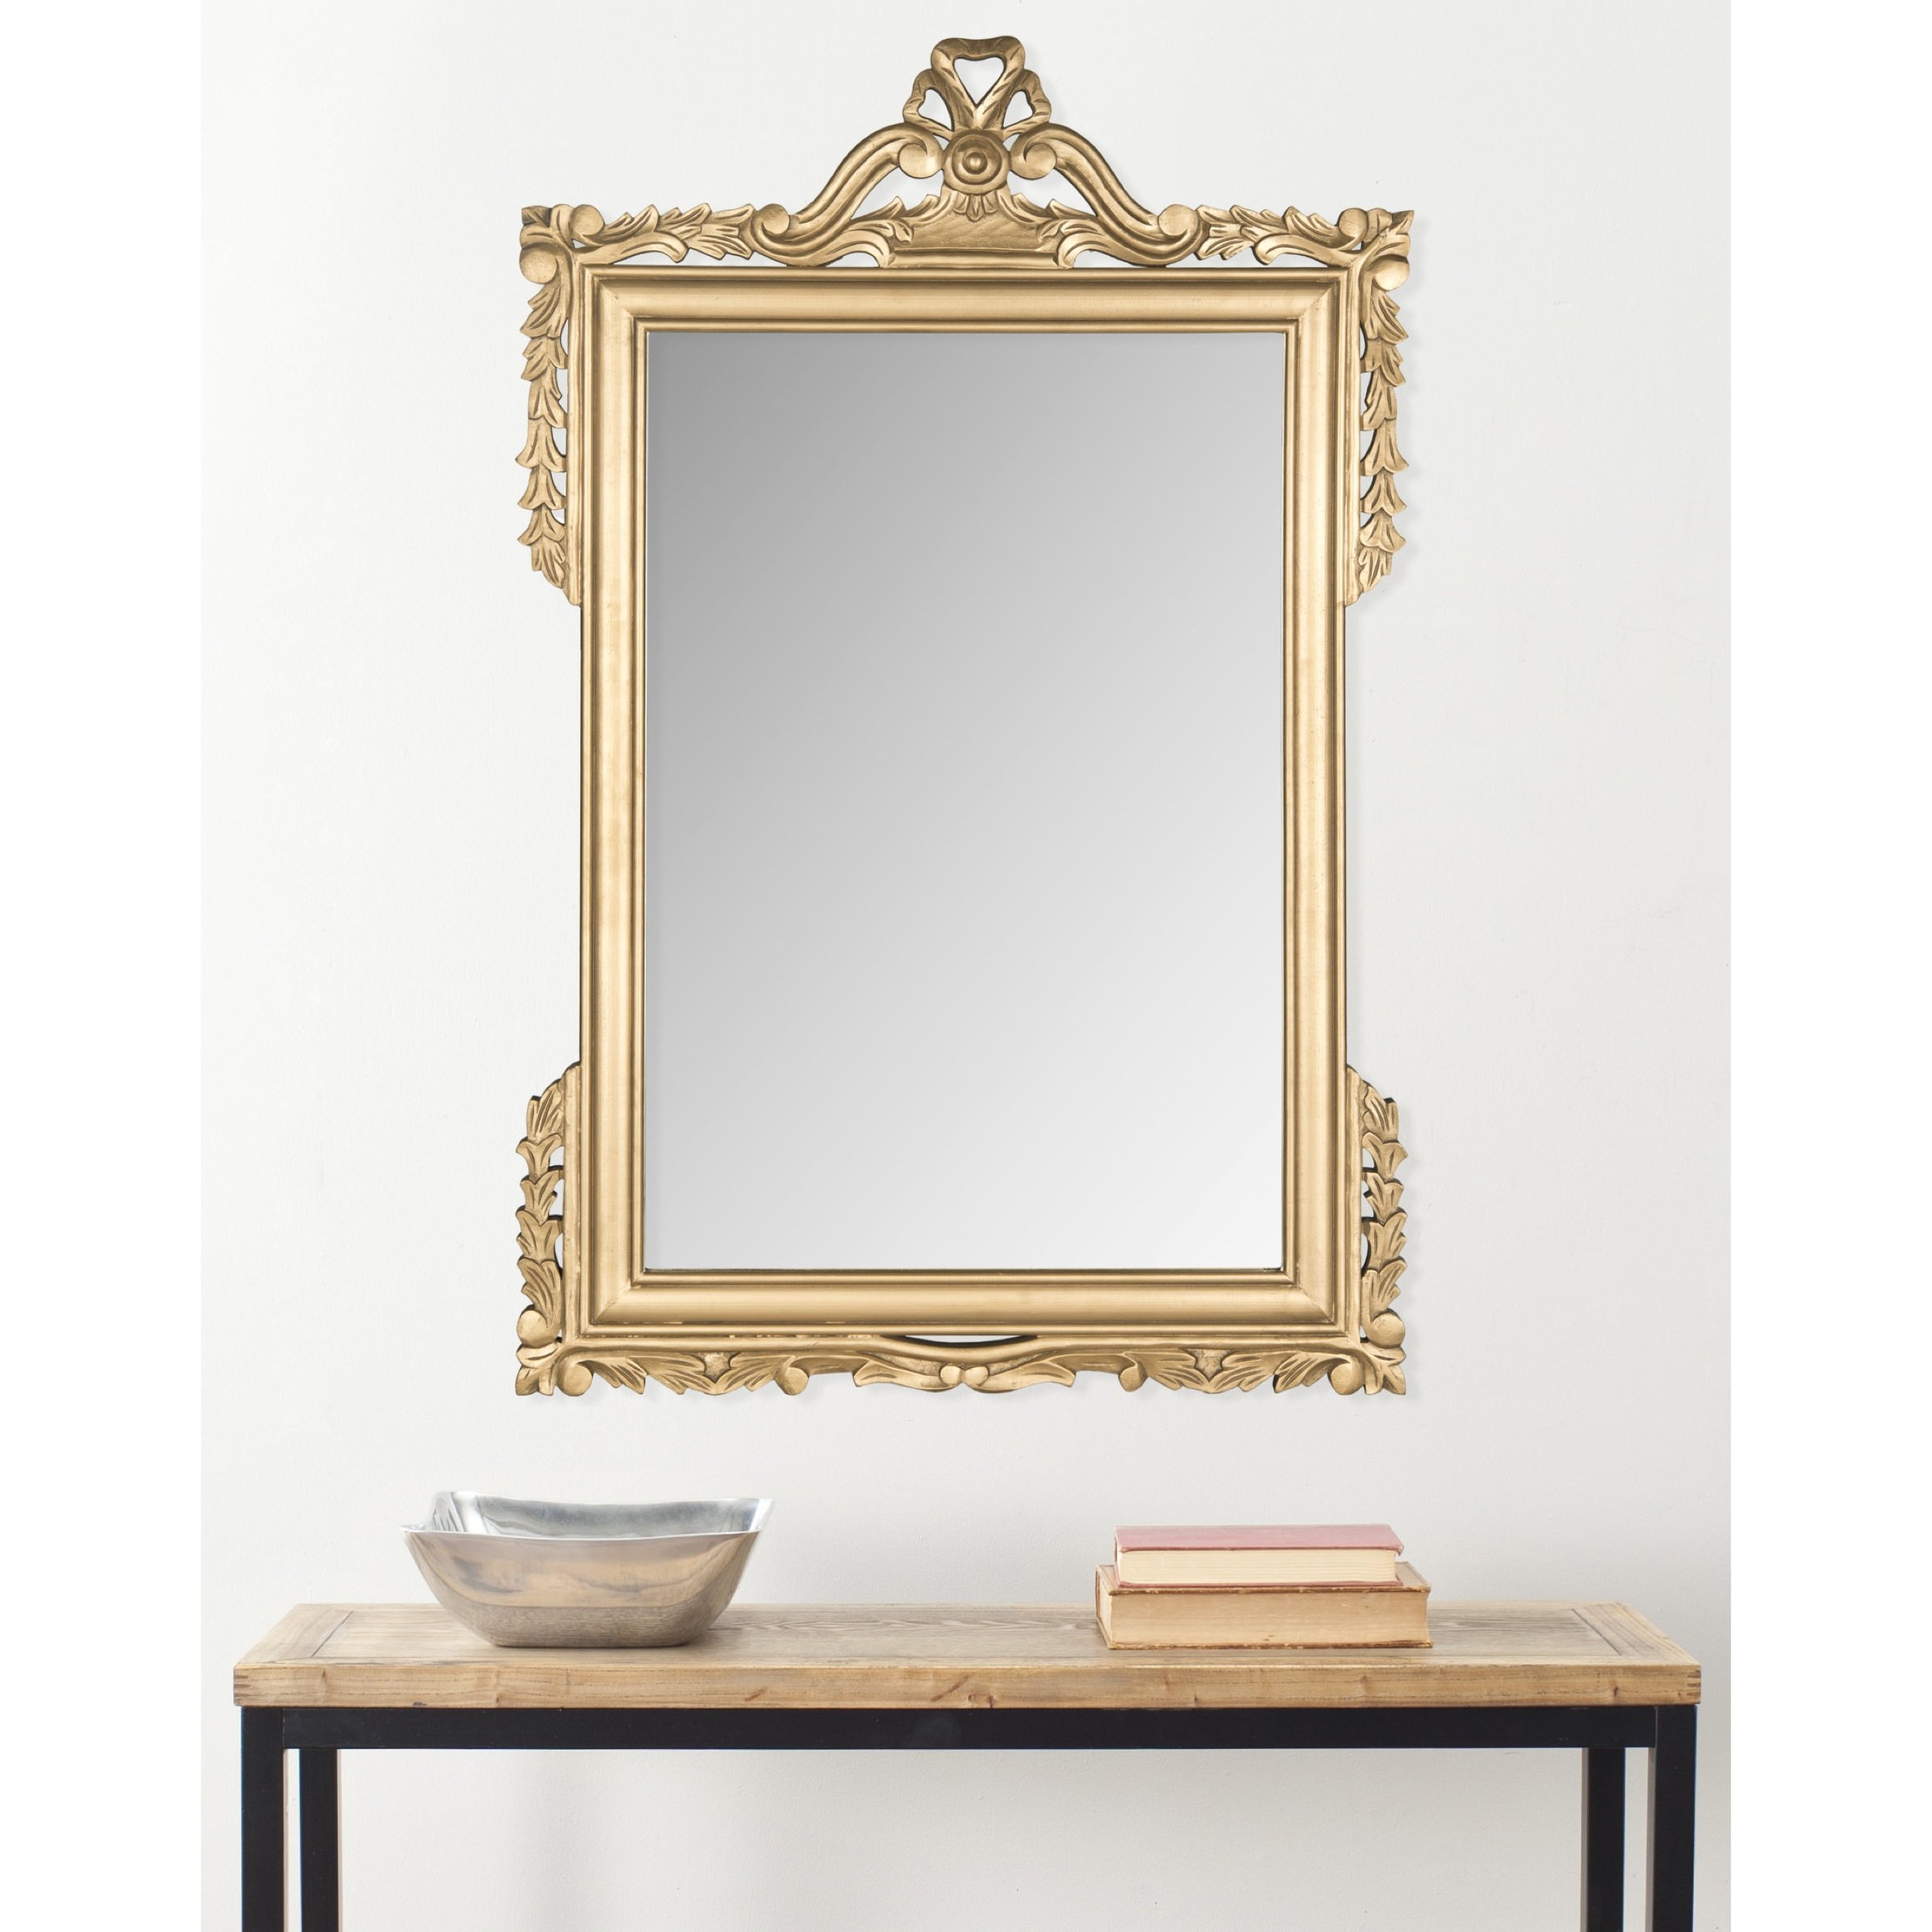 Shabby Elegance Wall Mirror | Wayfair In Epinal Shabby Elegance Wall Mirrors (Image 17 of 20)